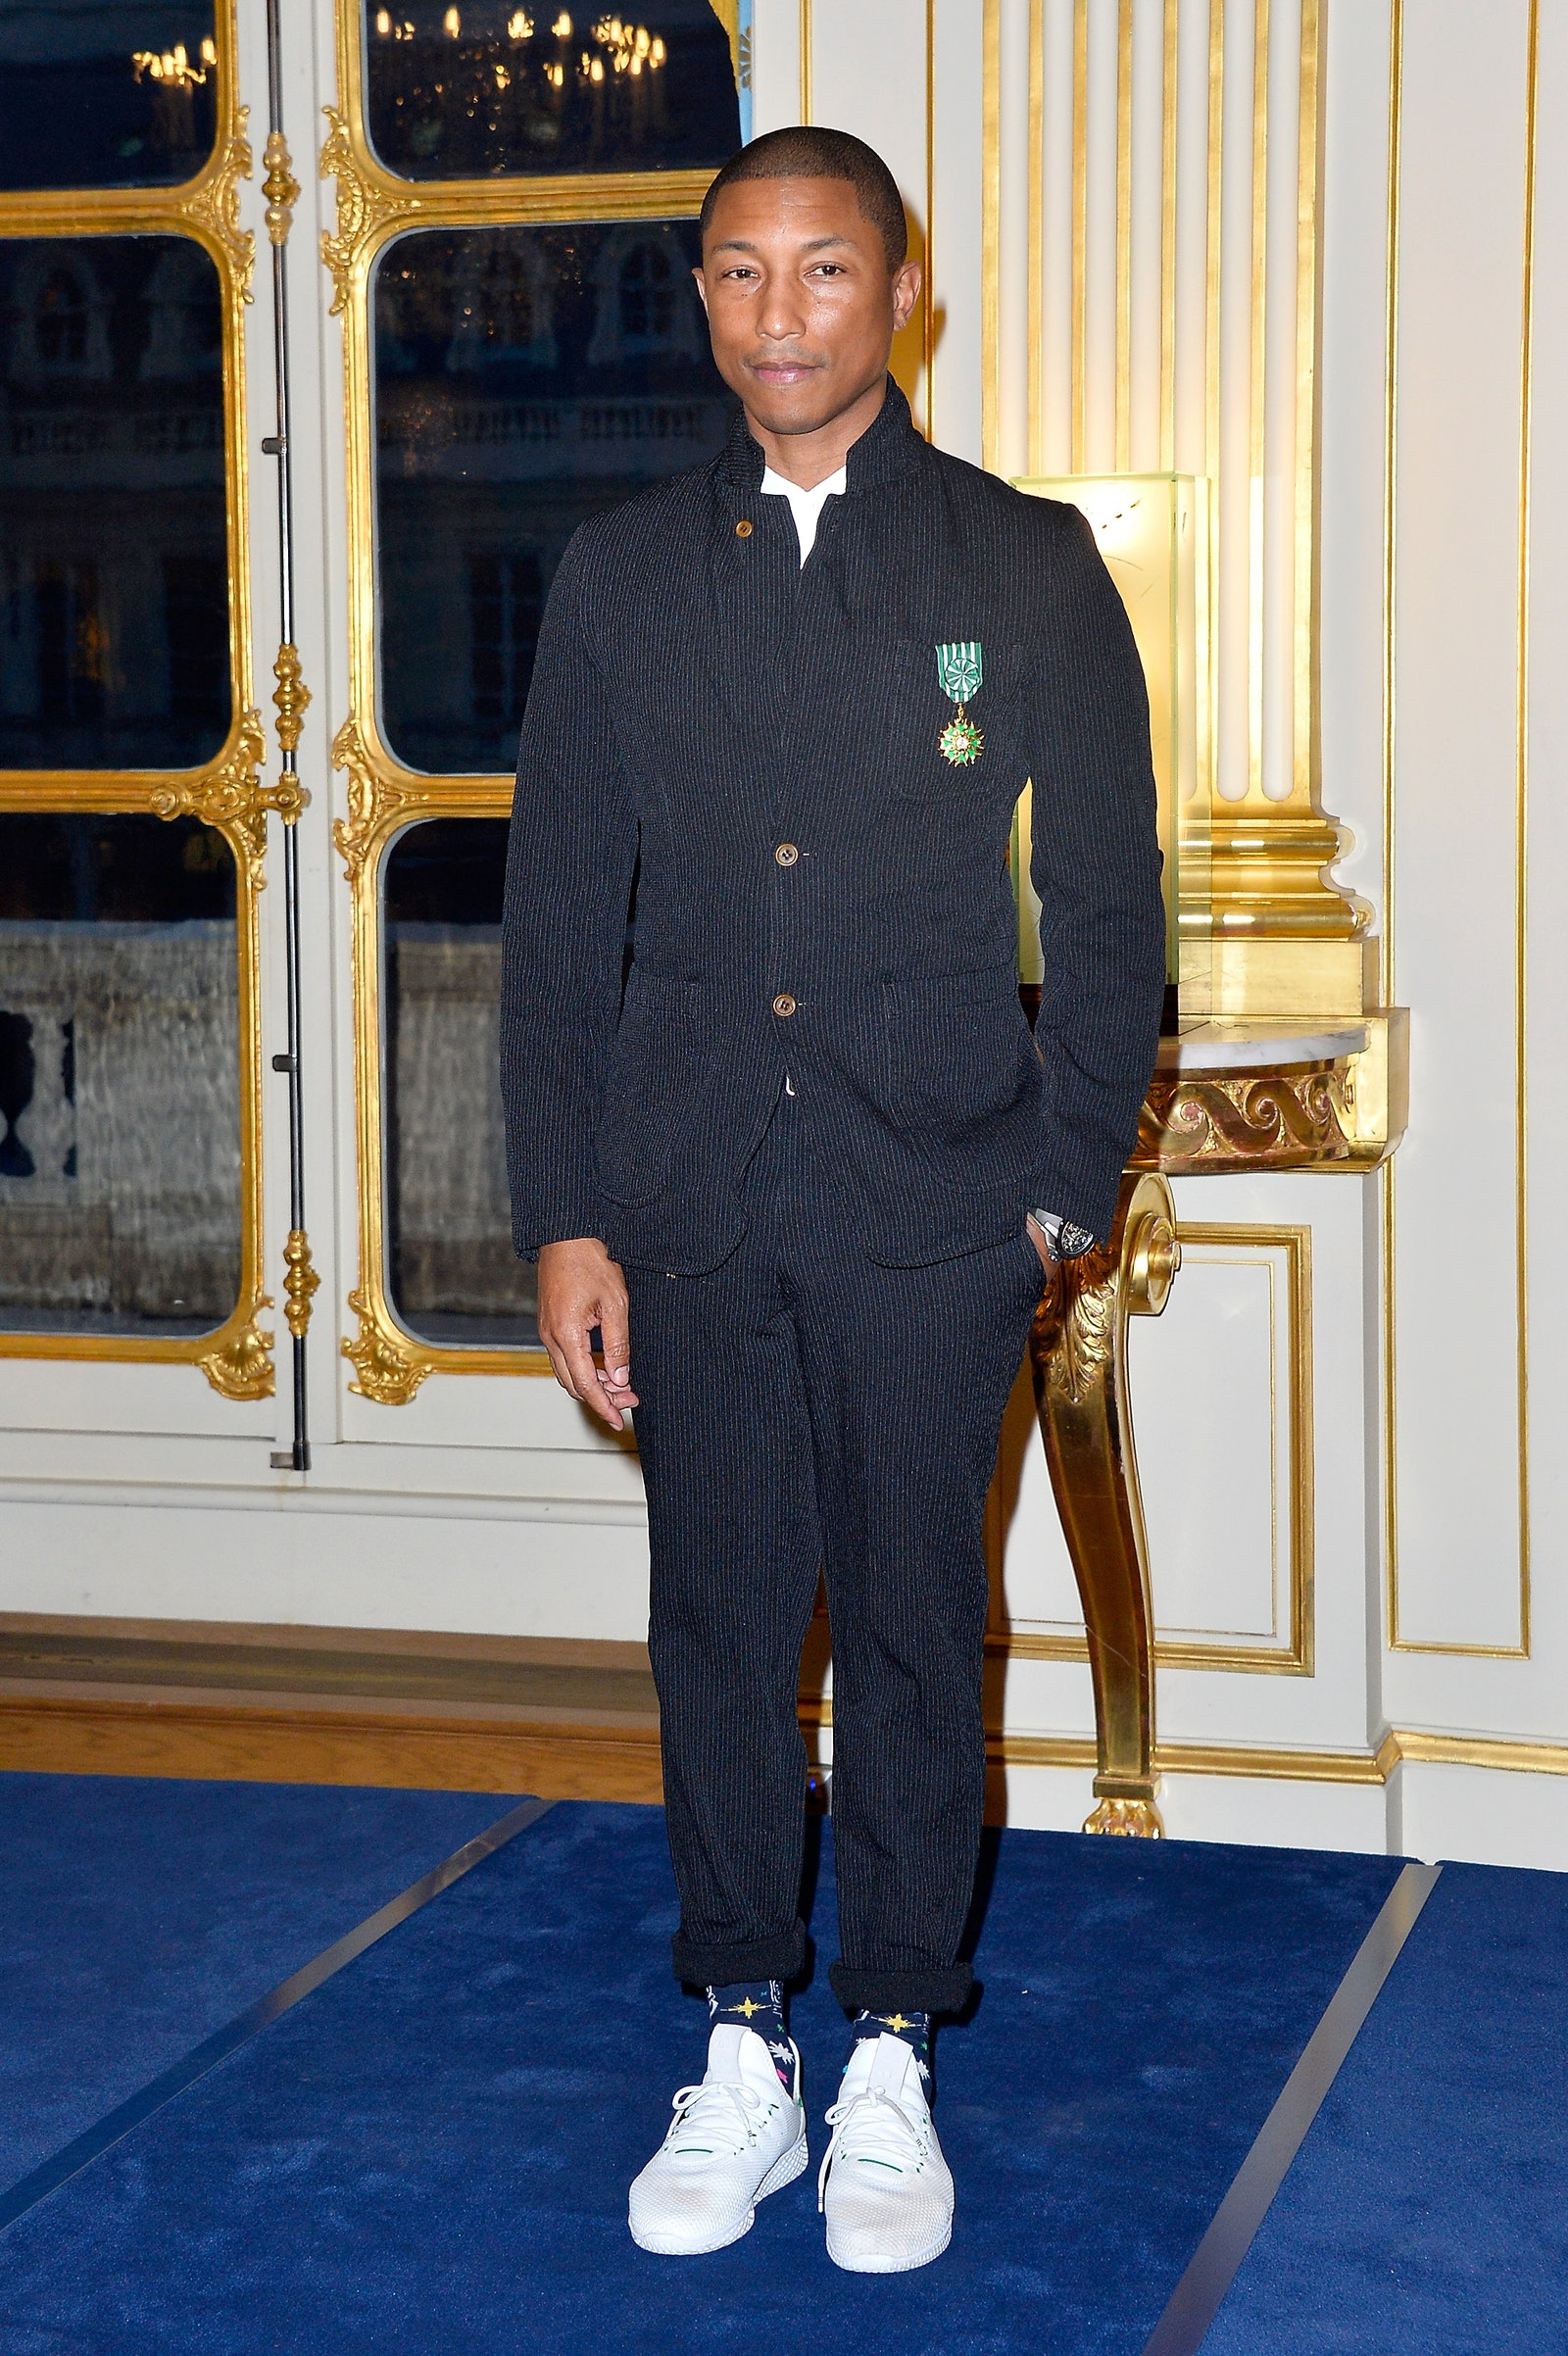 "Pharrell Williams recibiendo la medalla ""Officier De L'Ordre des Arts Et Des Lettres"" en París en 2017. Fotografía: Aurelien Meunier/Getty Images"